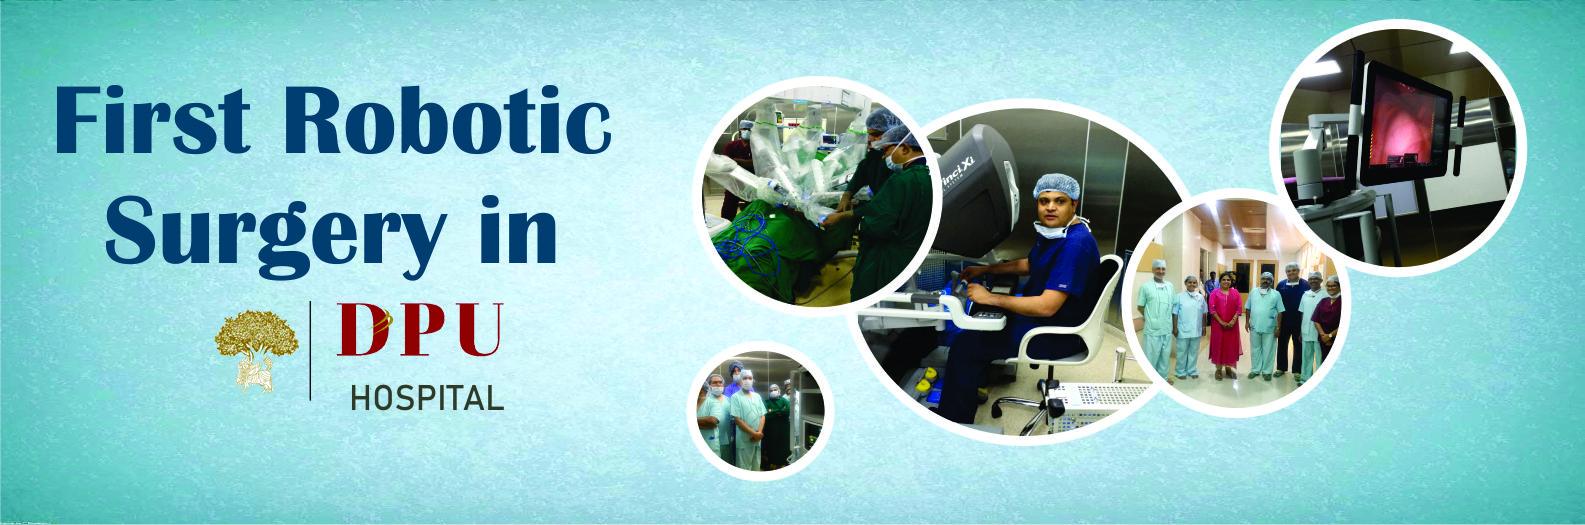 First Robotic Surgery